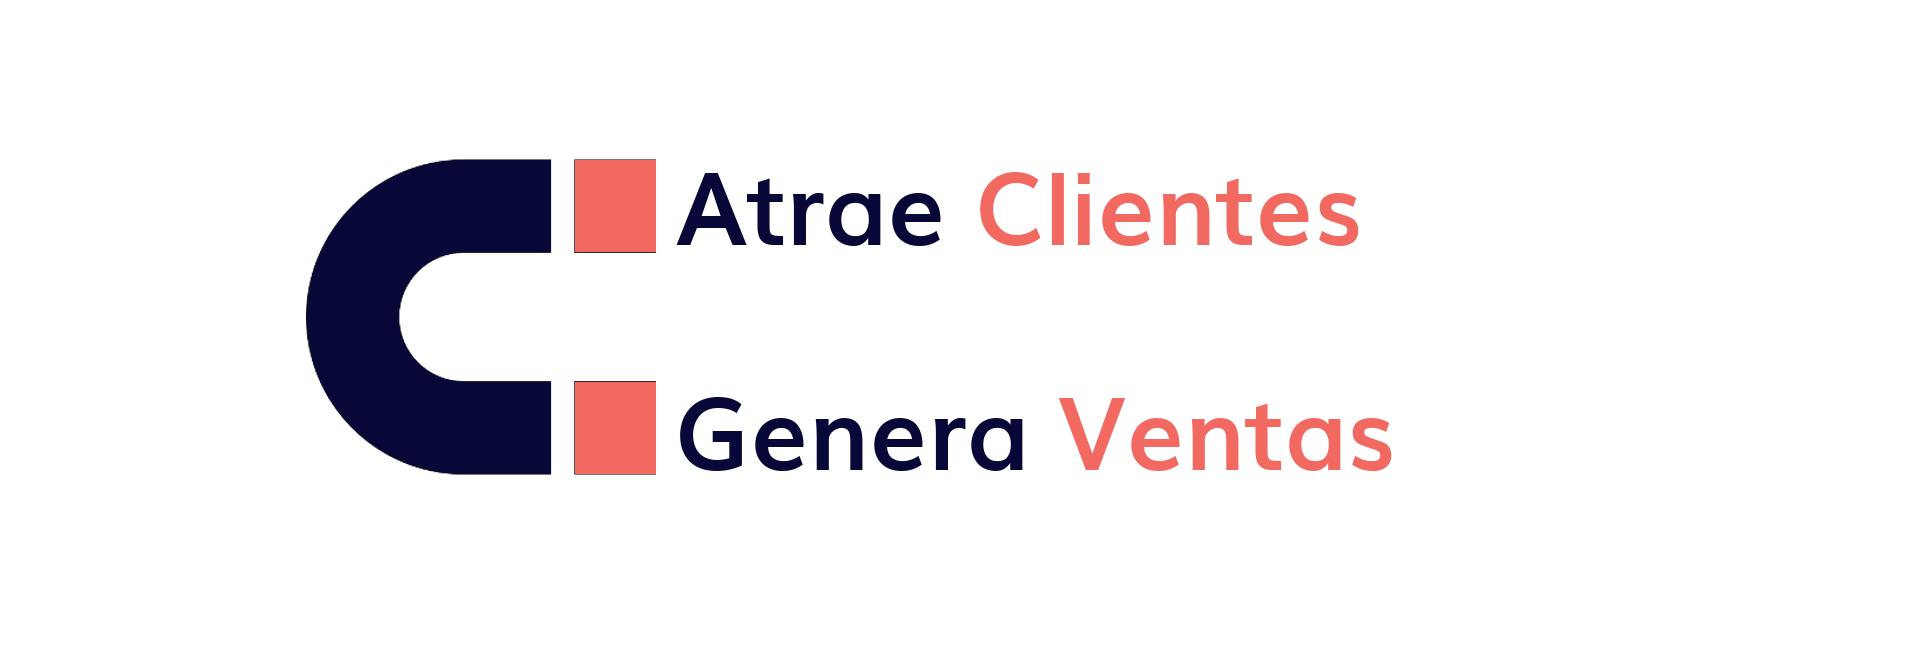 Atrae Clientes Genera Ventas 1